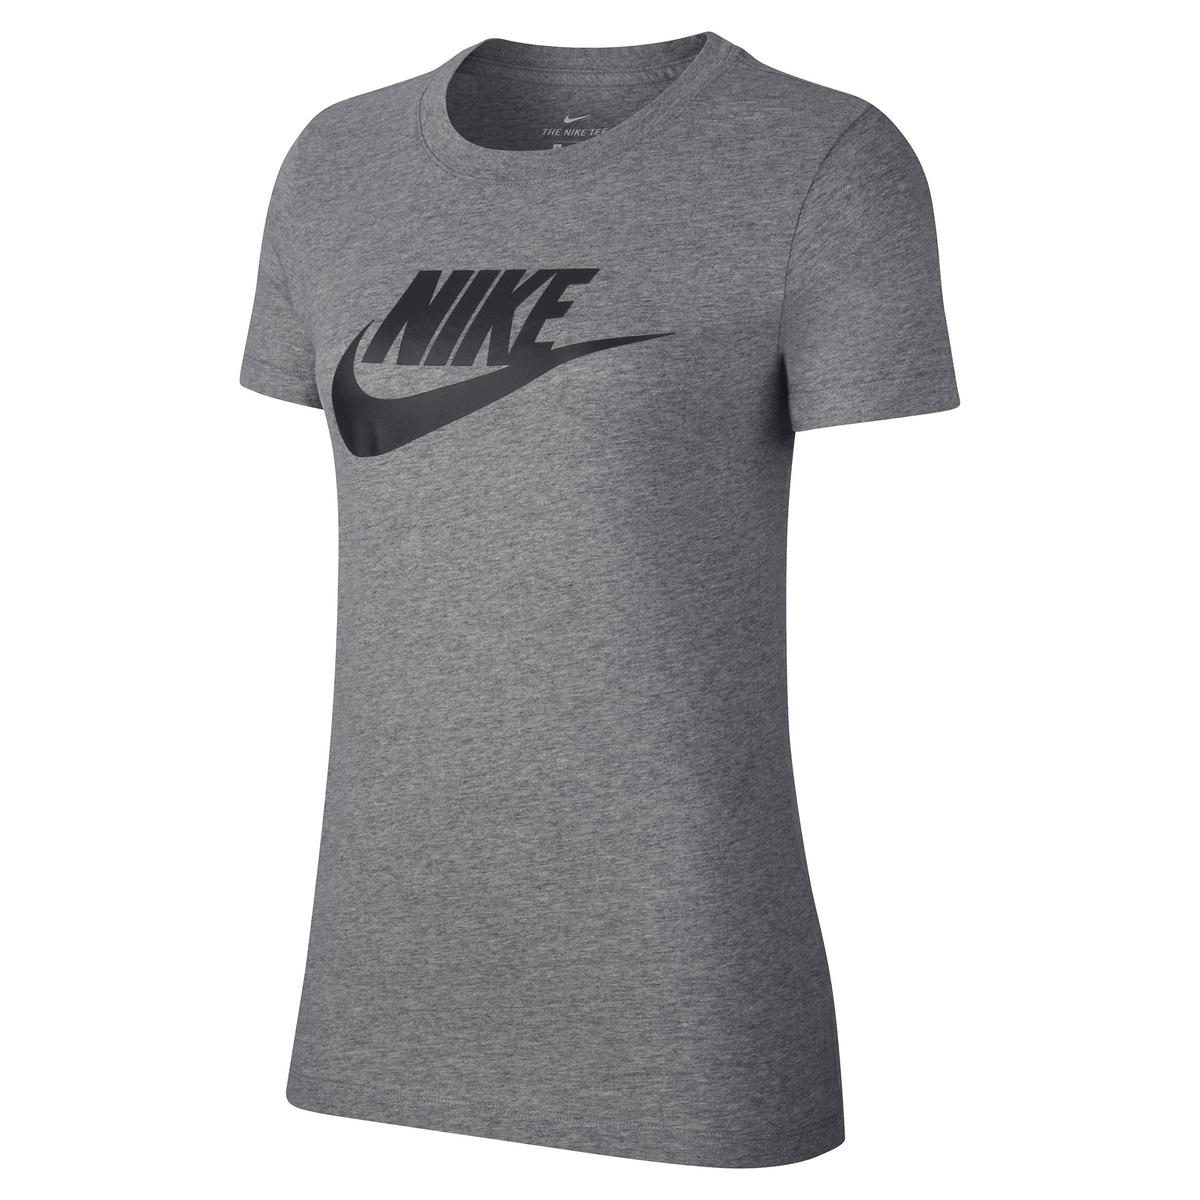 Camiseta Nike Sportswear logotipo delante